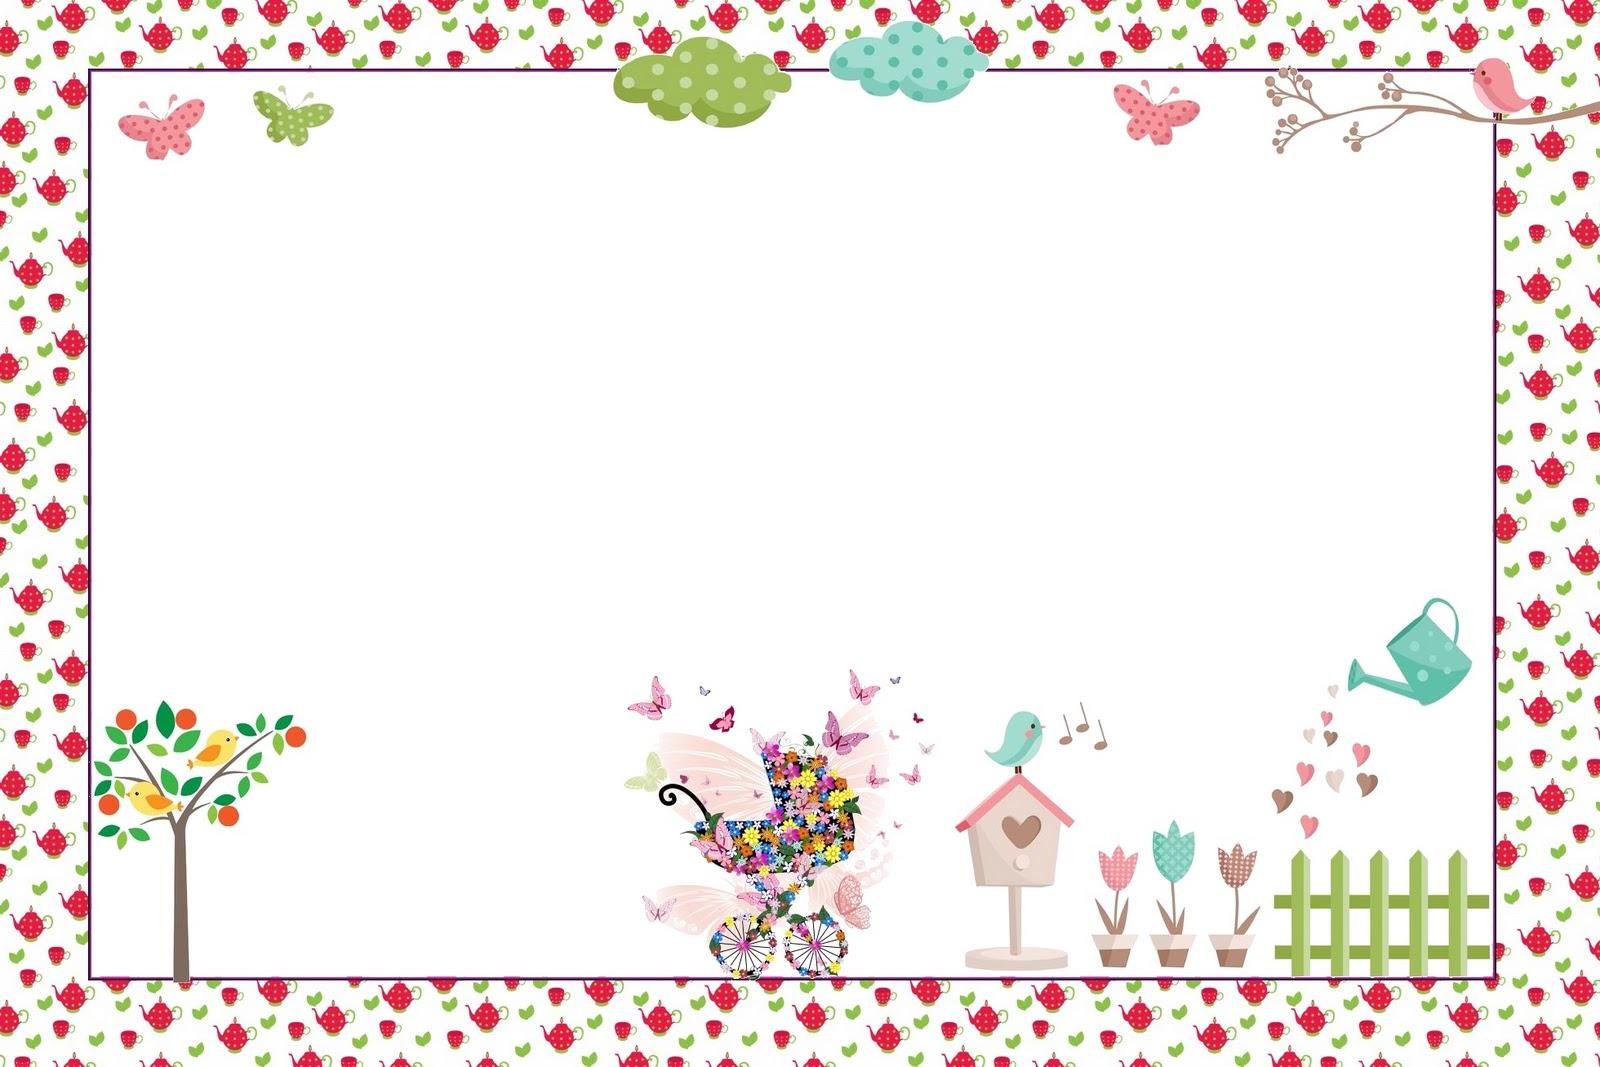 decoracao quarto de bebe jardim encantado: pra Festas Infantis: Convites para imprimir – Tema Jardim Encantado